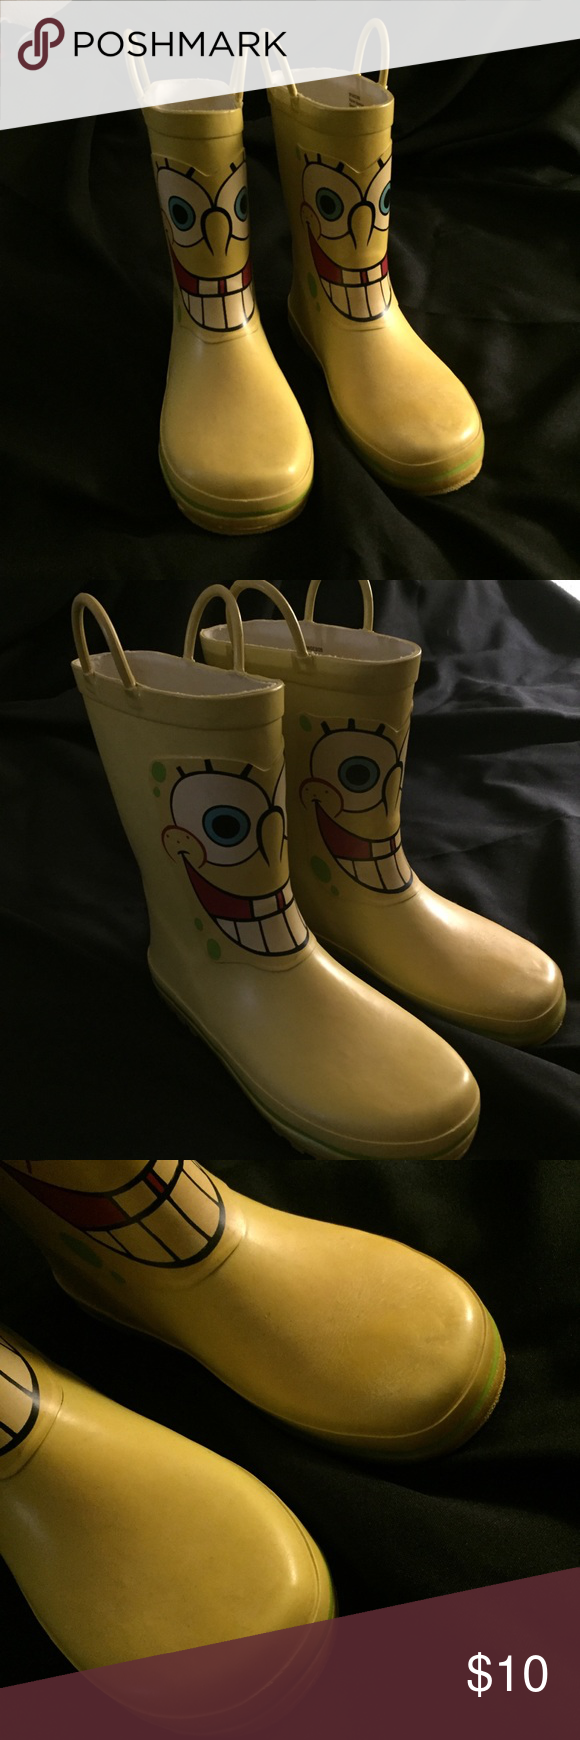 spongebob squarepants rain boots pinterest spongebob squarepants